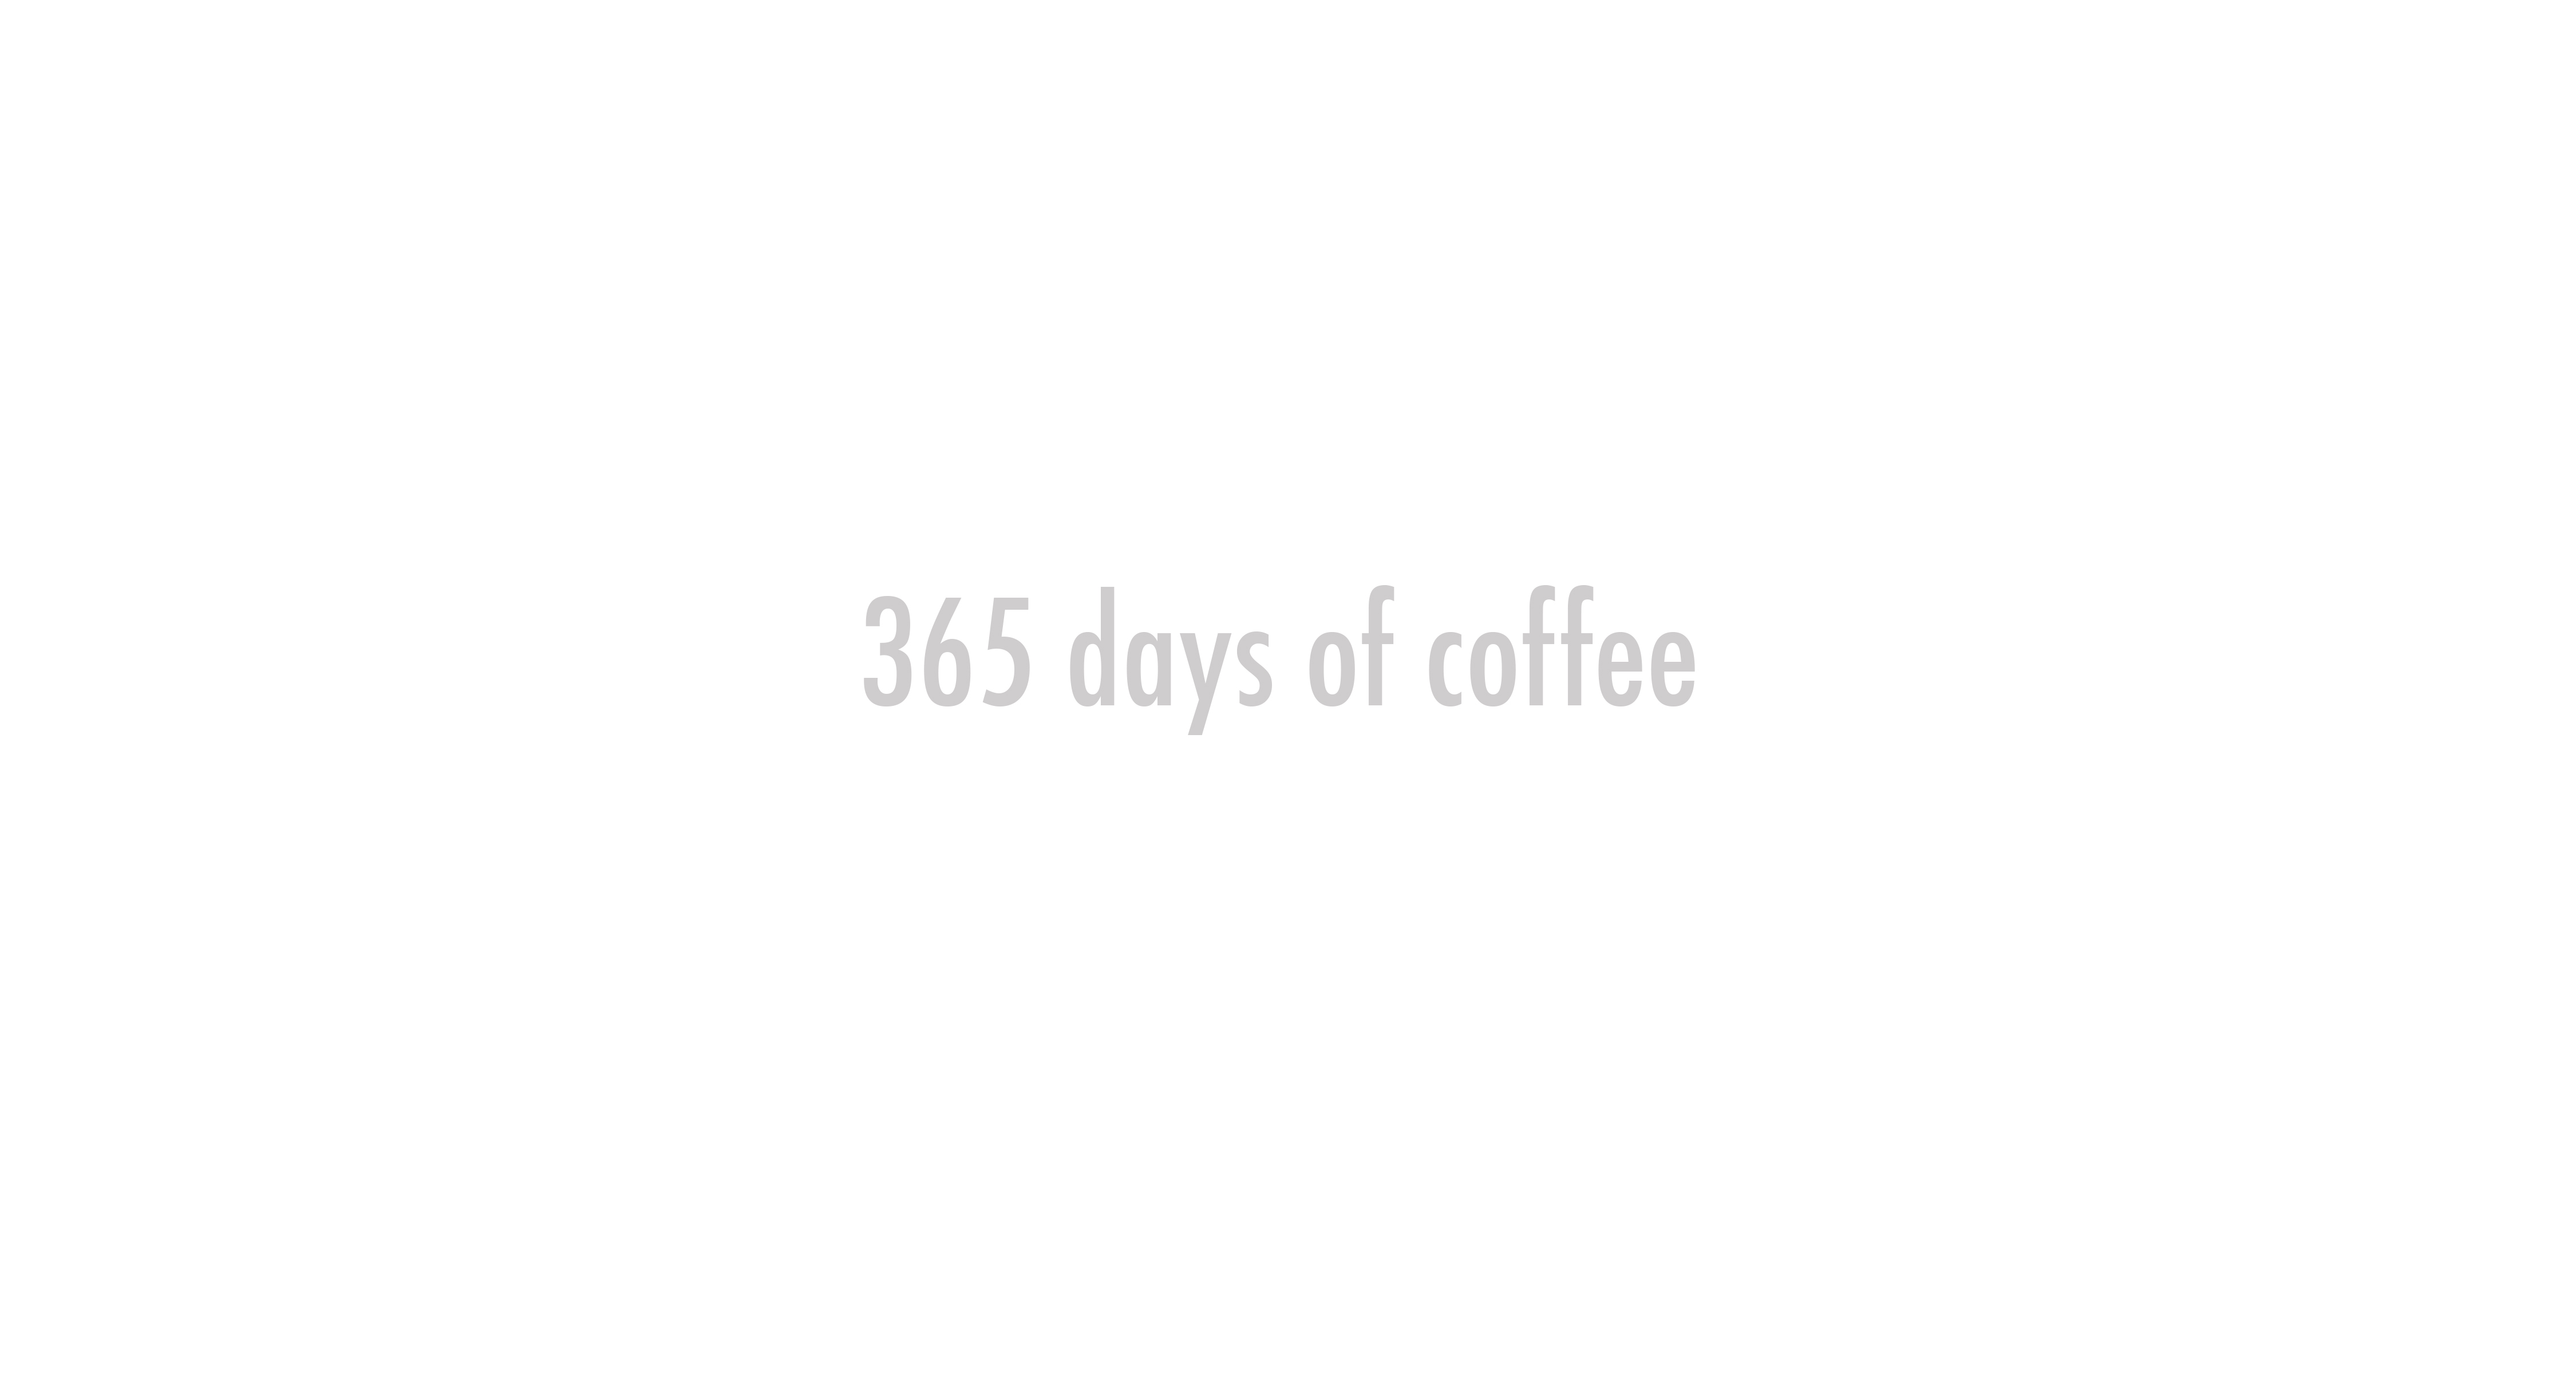 Hario woodneck coffee drip pot - 365 Days Of Coffee